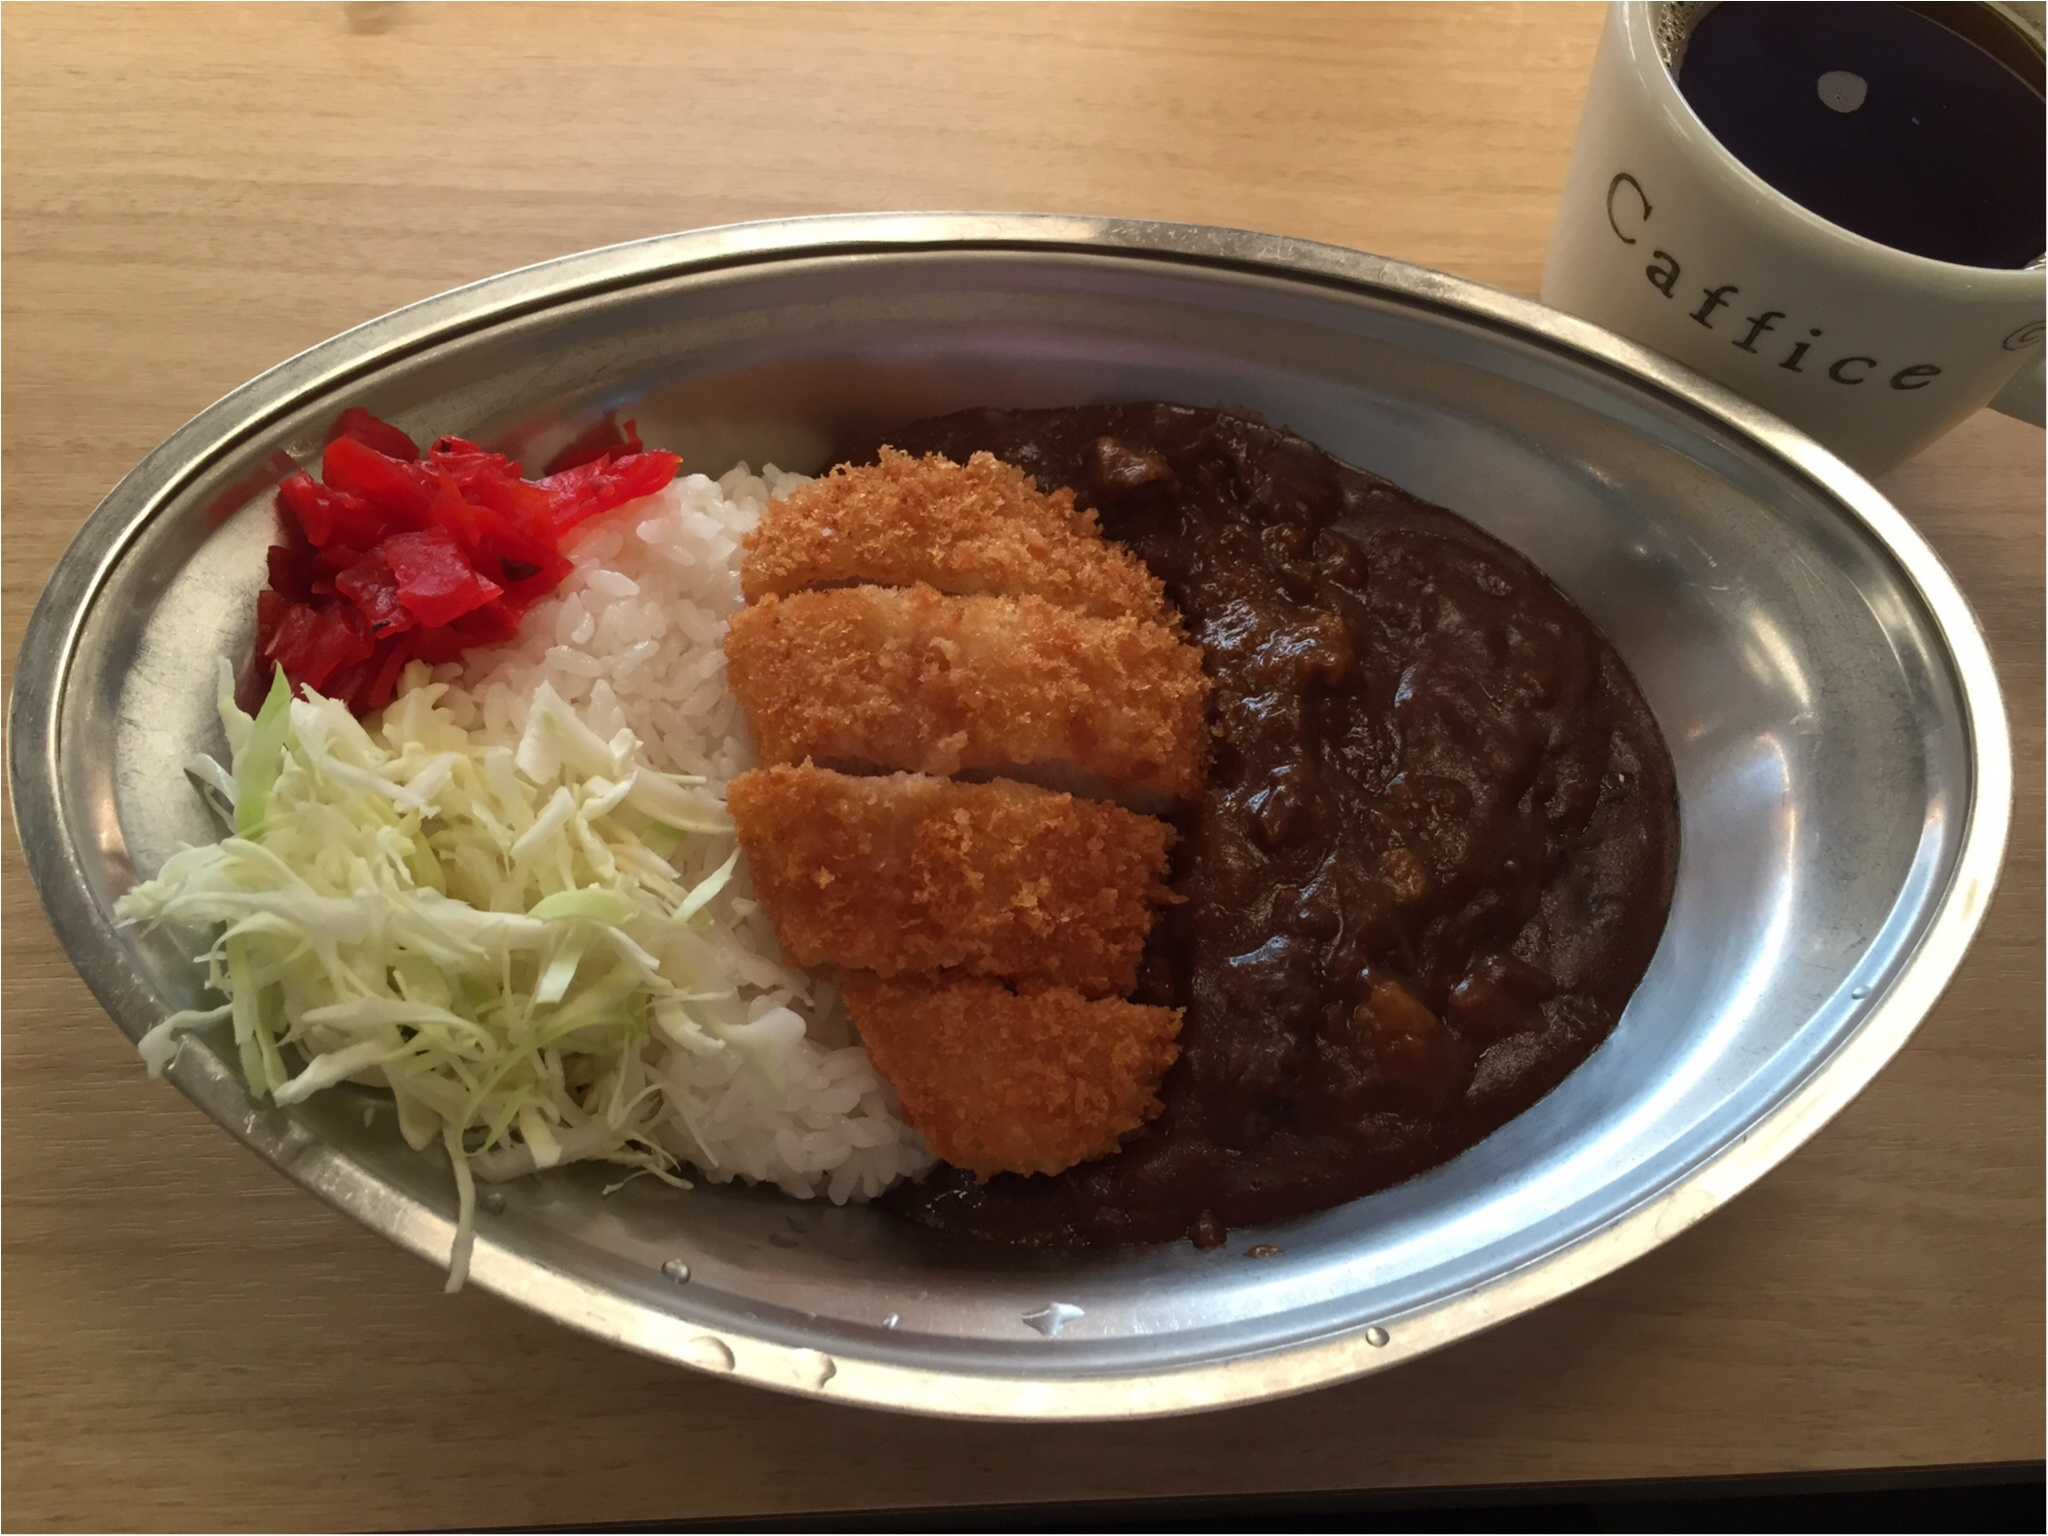 《*Cafe*》新宿三丁目駅直結!電源Wi-Fi完備のCAFE+Office✨メニューも充実のCafficeがお薦め☆_4